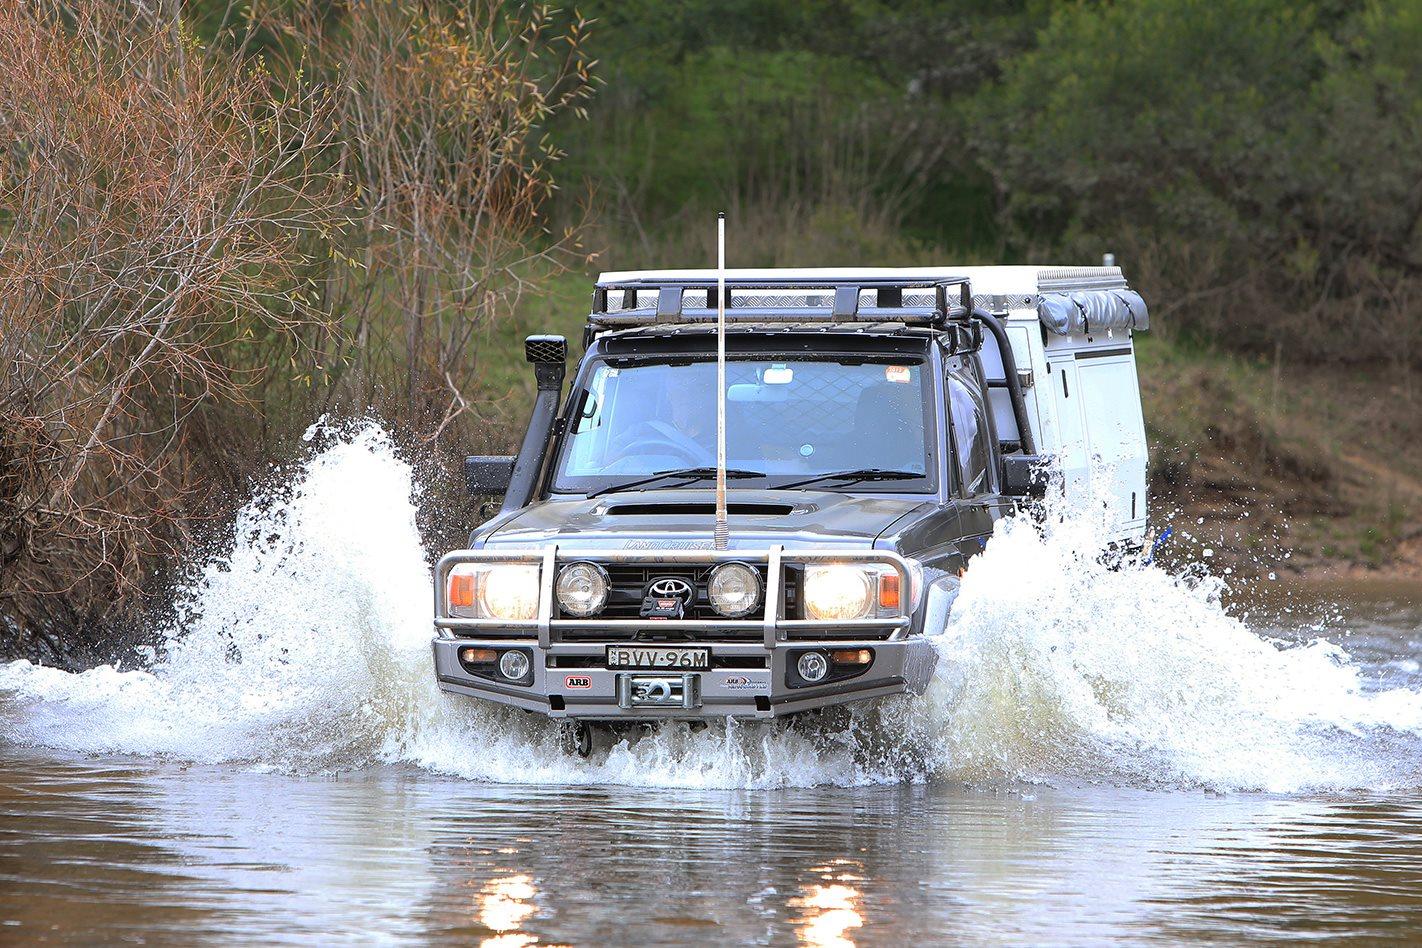 2011 Toyota 79 Series Land Cruiser GX custom water crossing